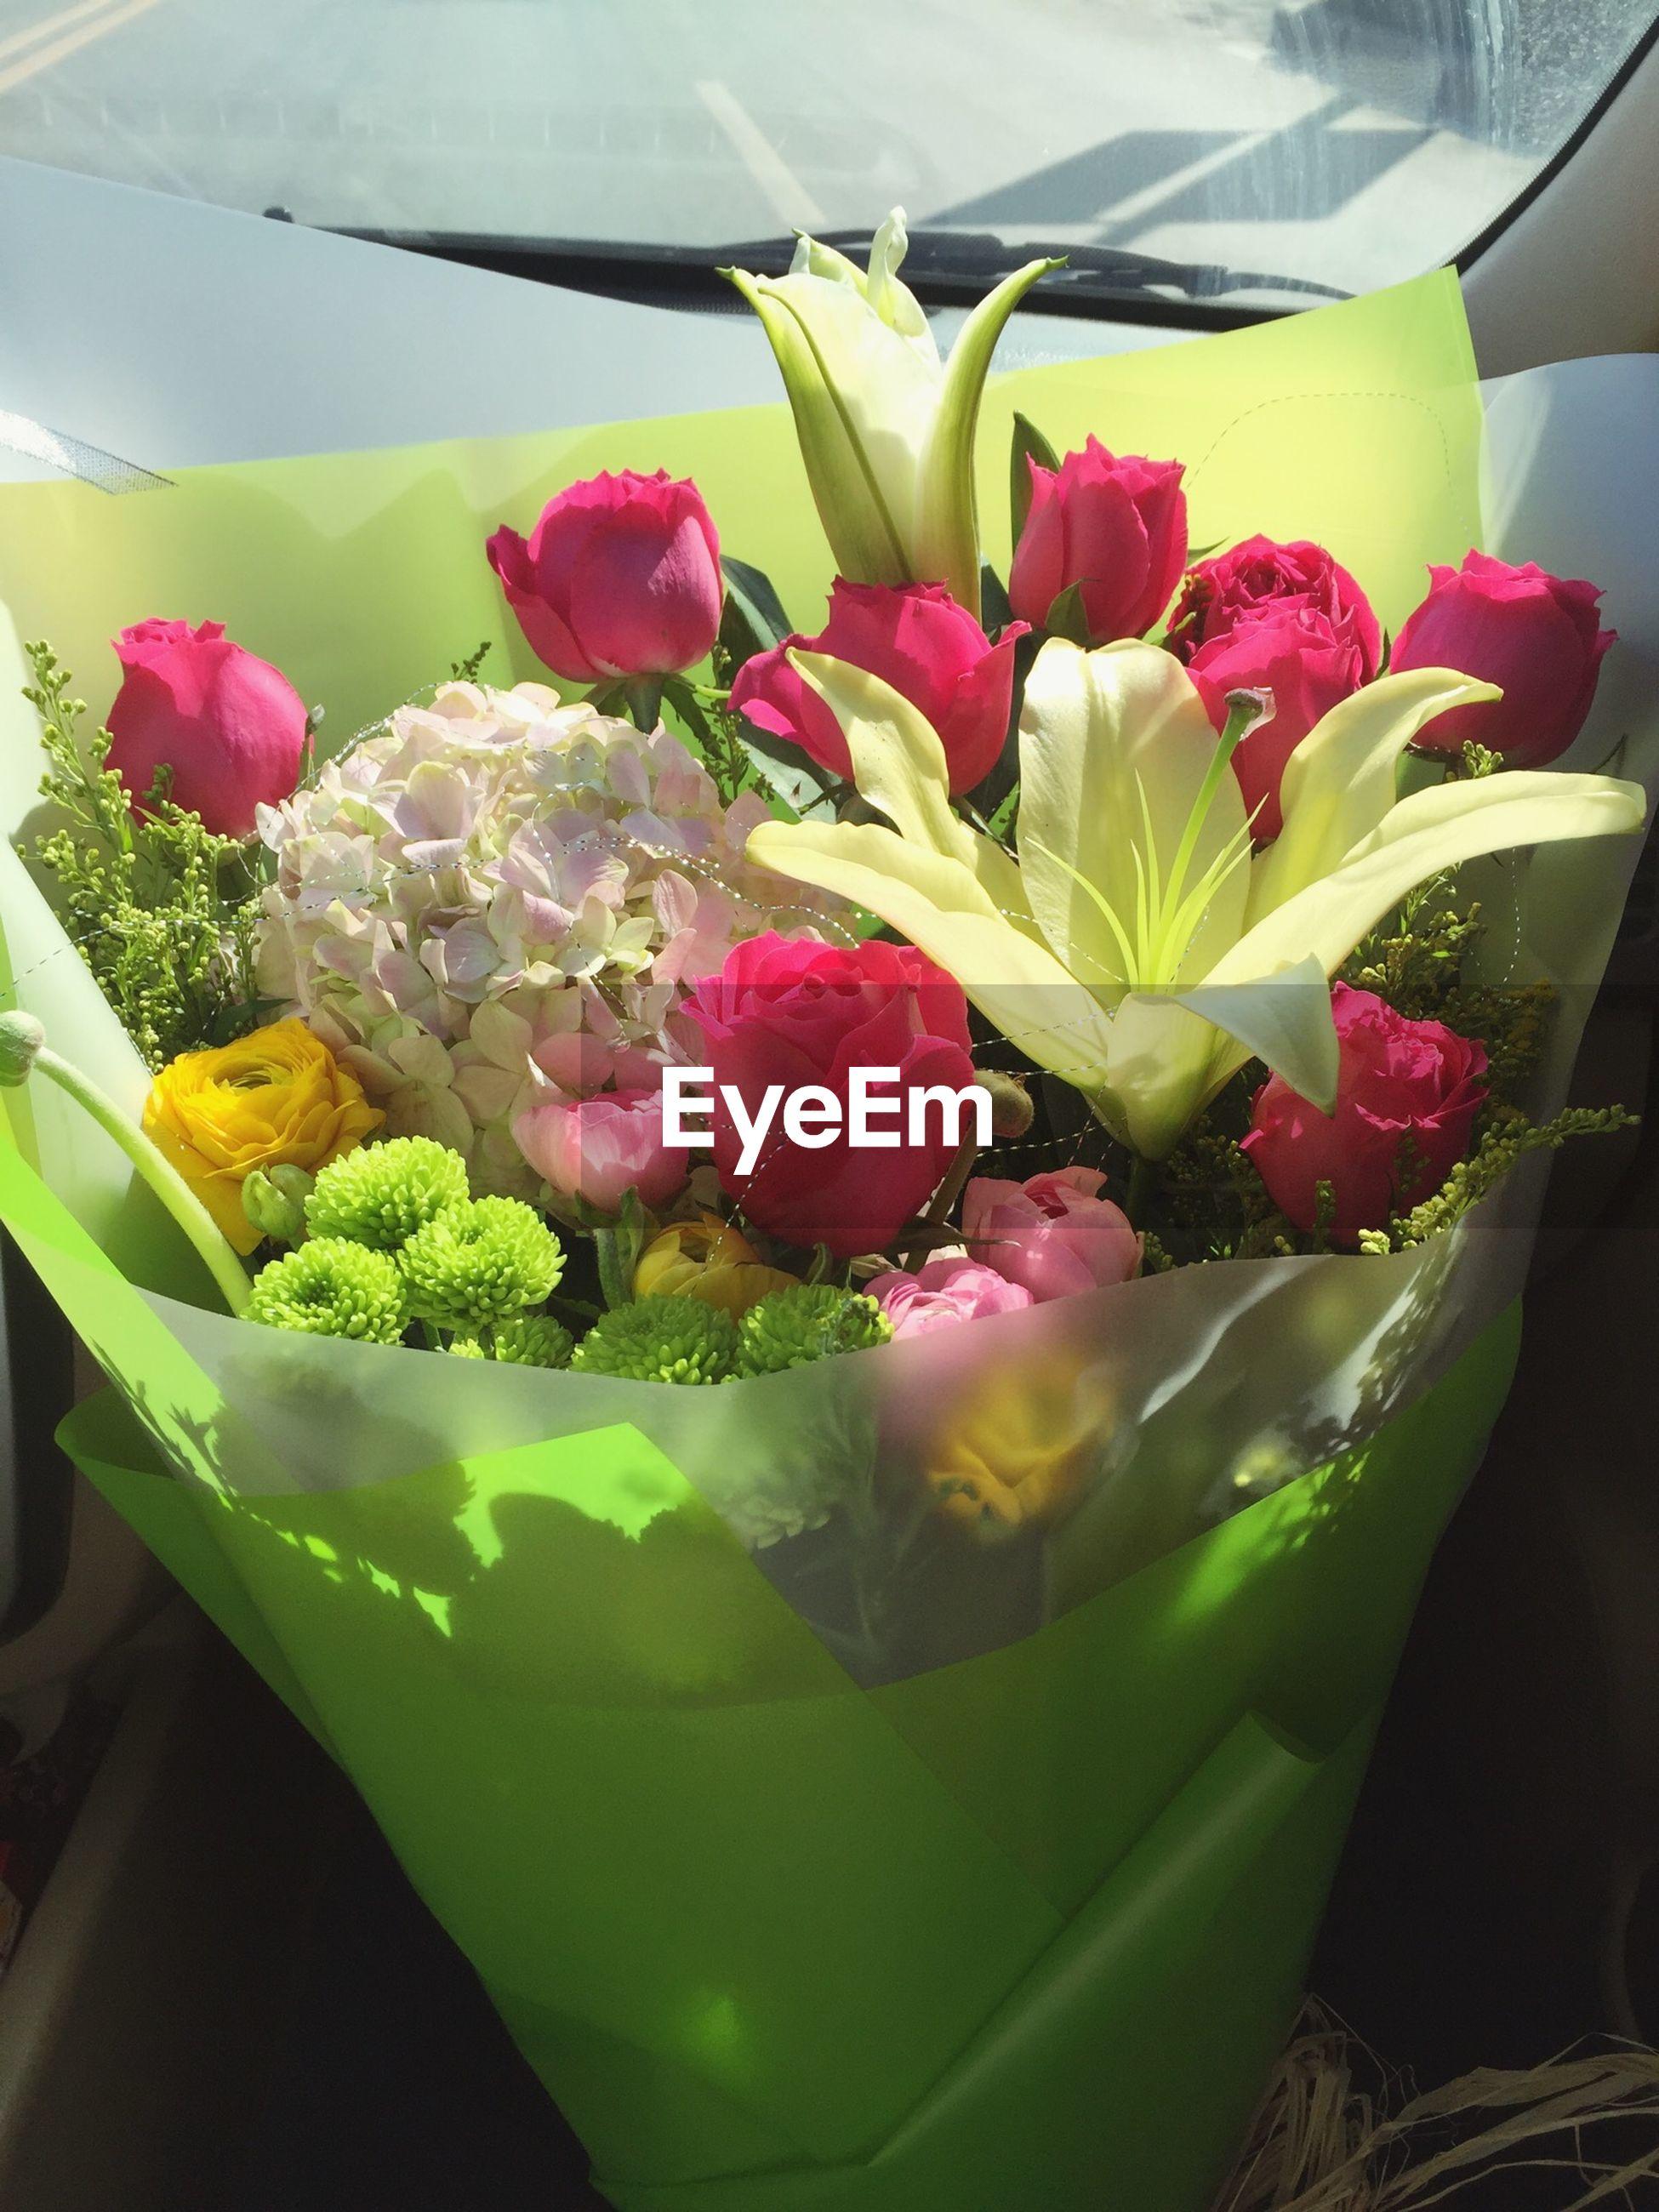 flower, freshness, indoors, fragility, petal, plant, close-up, flower head, beauty in nature, pink color, growth, leaf, nature, vase, tulip, variation, no people, potted plant, flower arrangement, green color